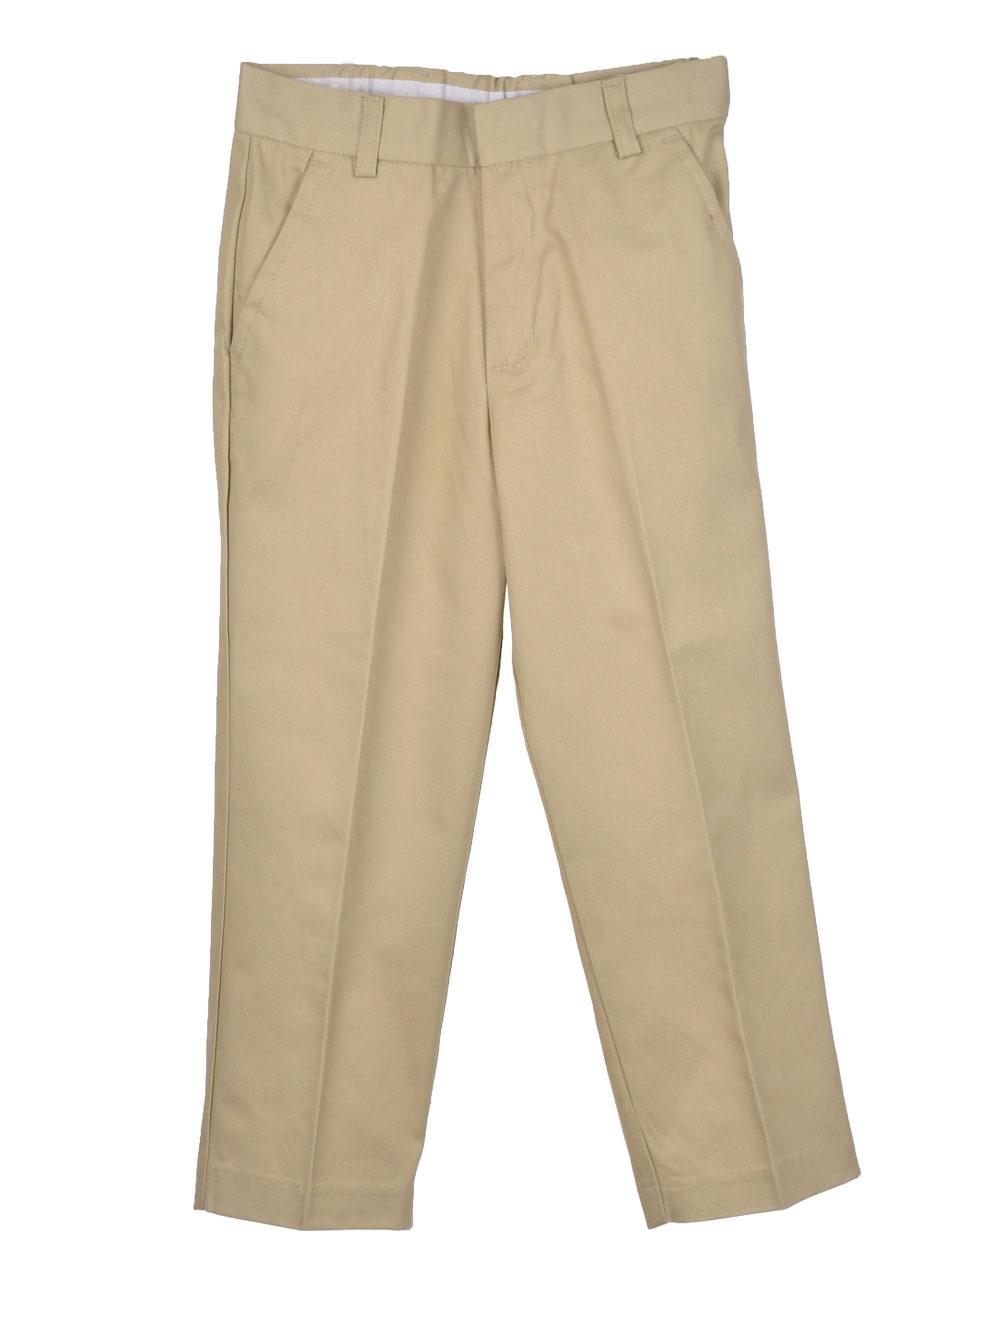 Image of Preferred School Uniforms Big Boys Double Knee Flat Front Pants Sizes 8  20  khaki 10